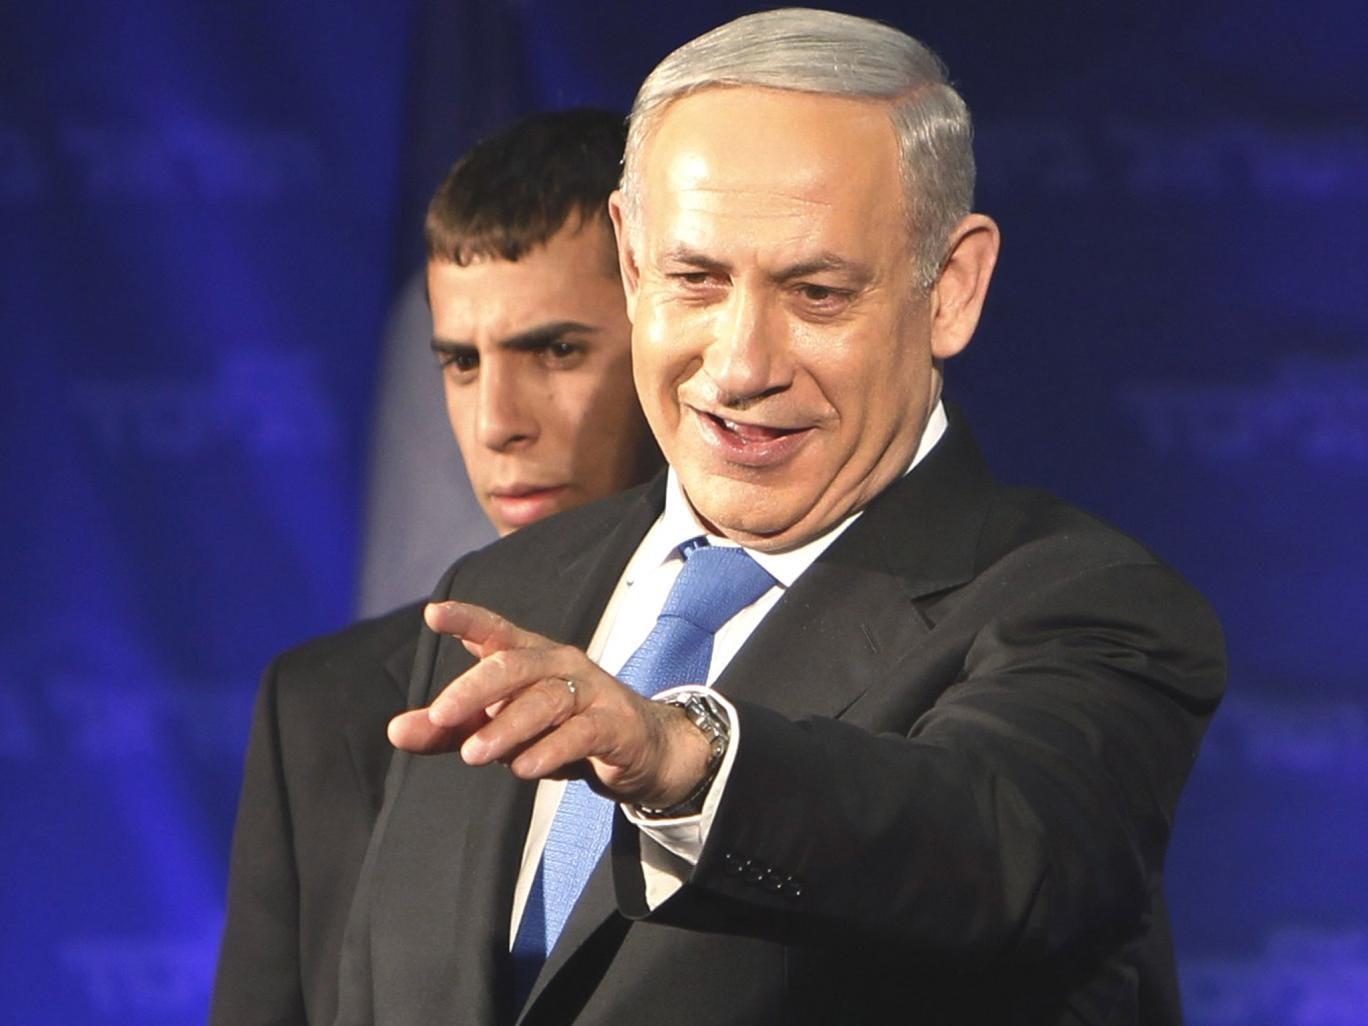 Benjamin Netanyahu celebrates in Tel Aviv on Tuesday night